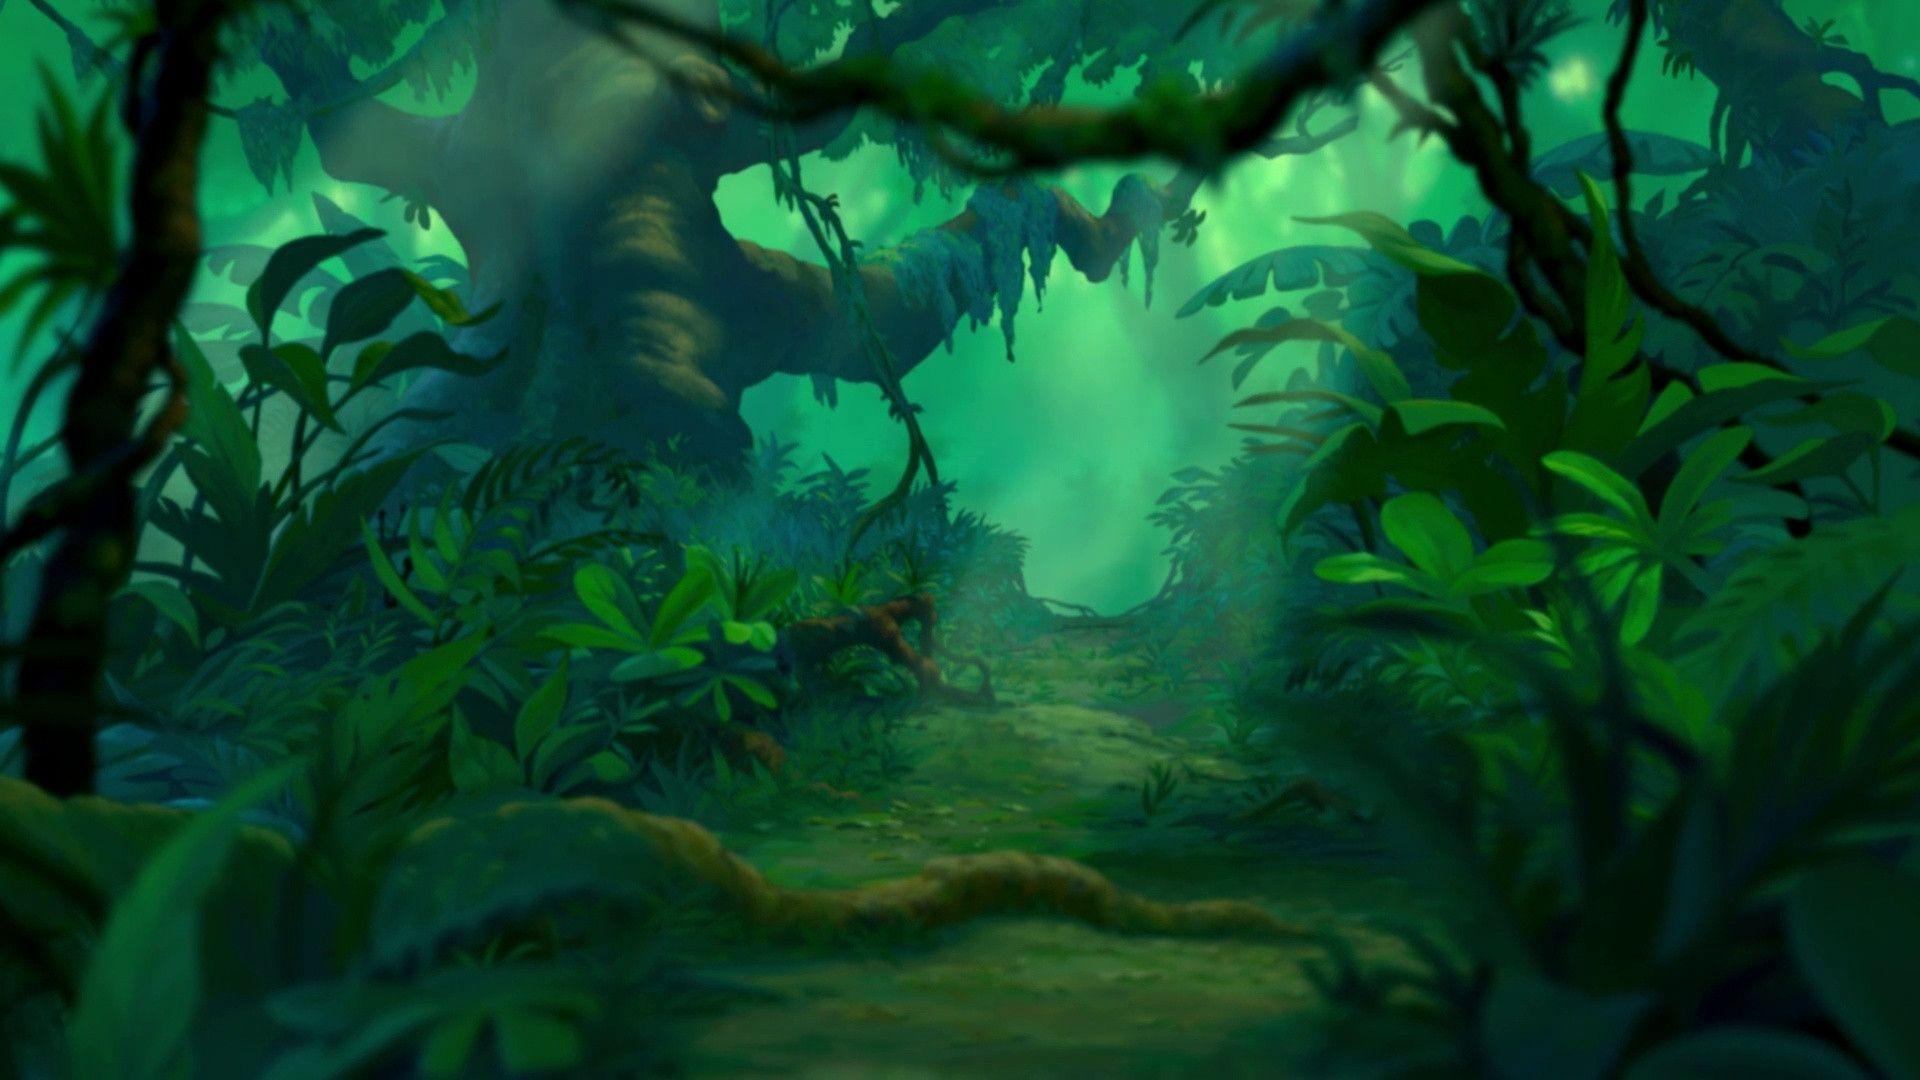 The Lion King The Lion King 1994 Jungle Scene Lion King